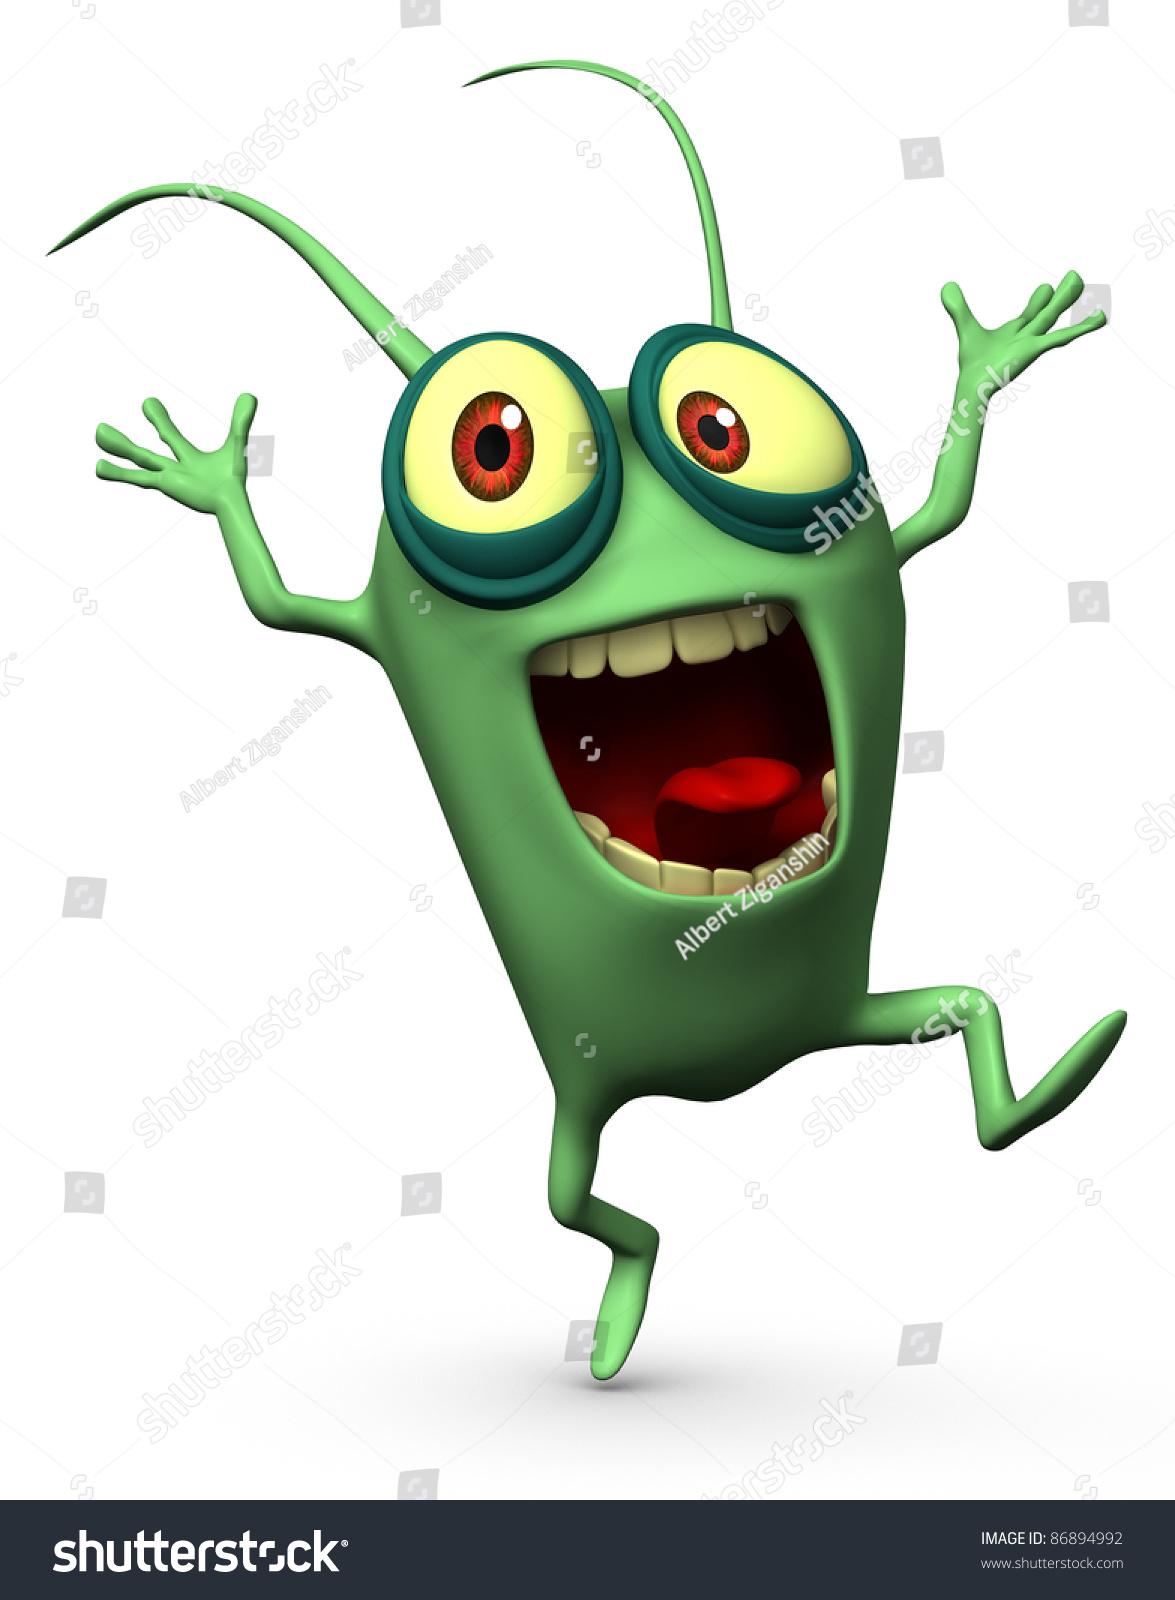 Happy Green Computer Virus Stock Photo 86894992 : Shutterstock